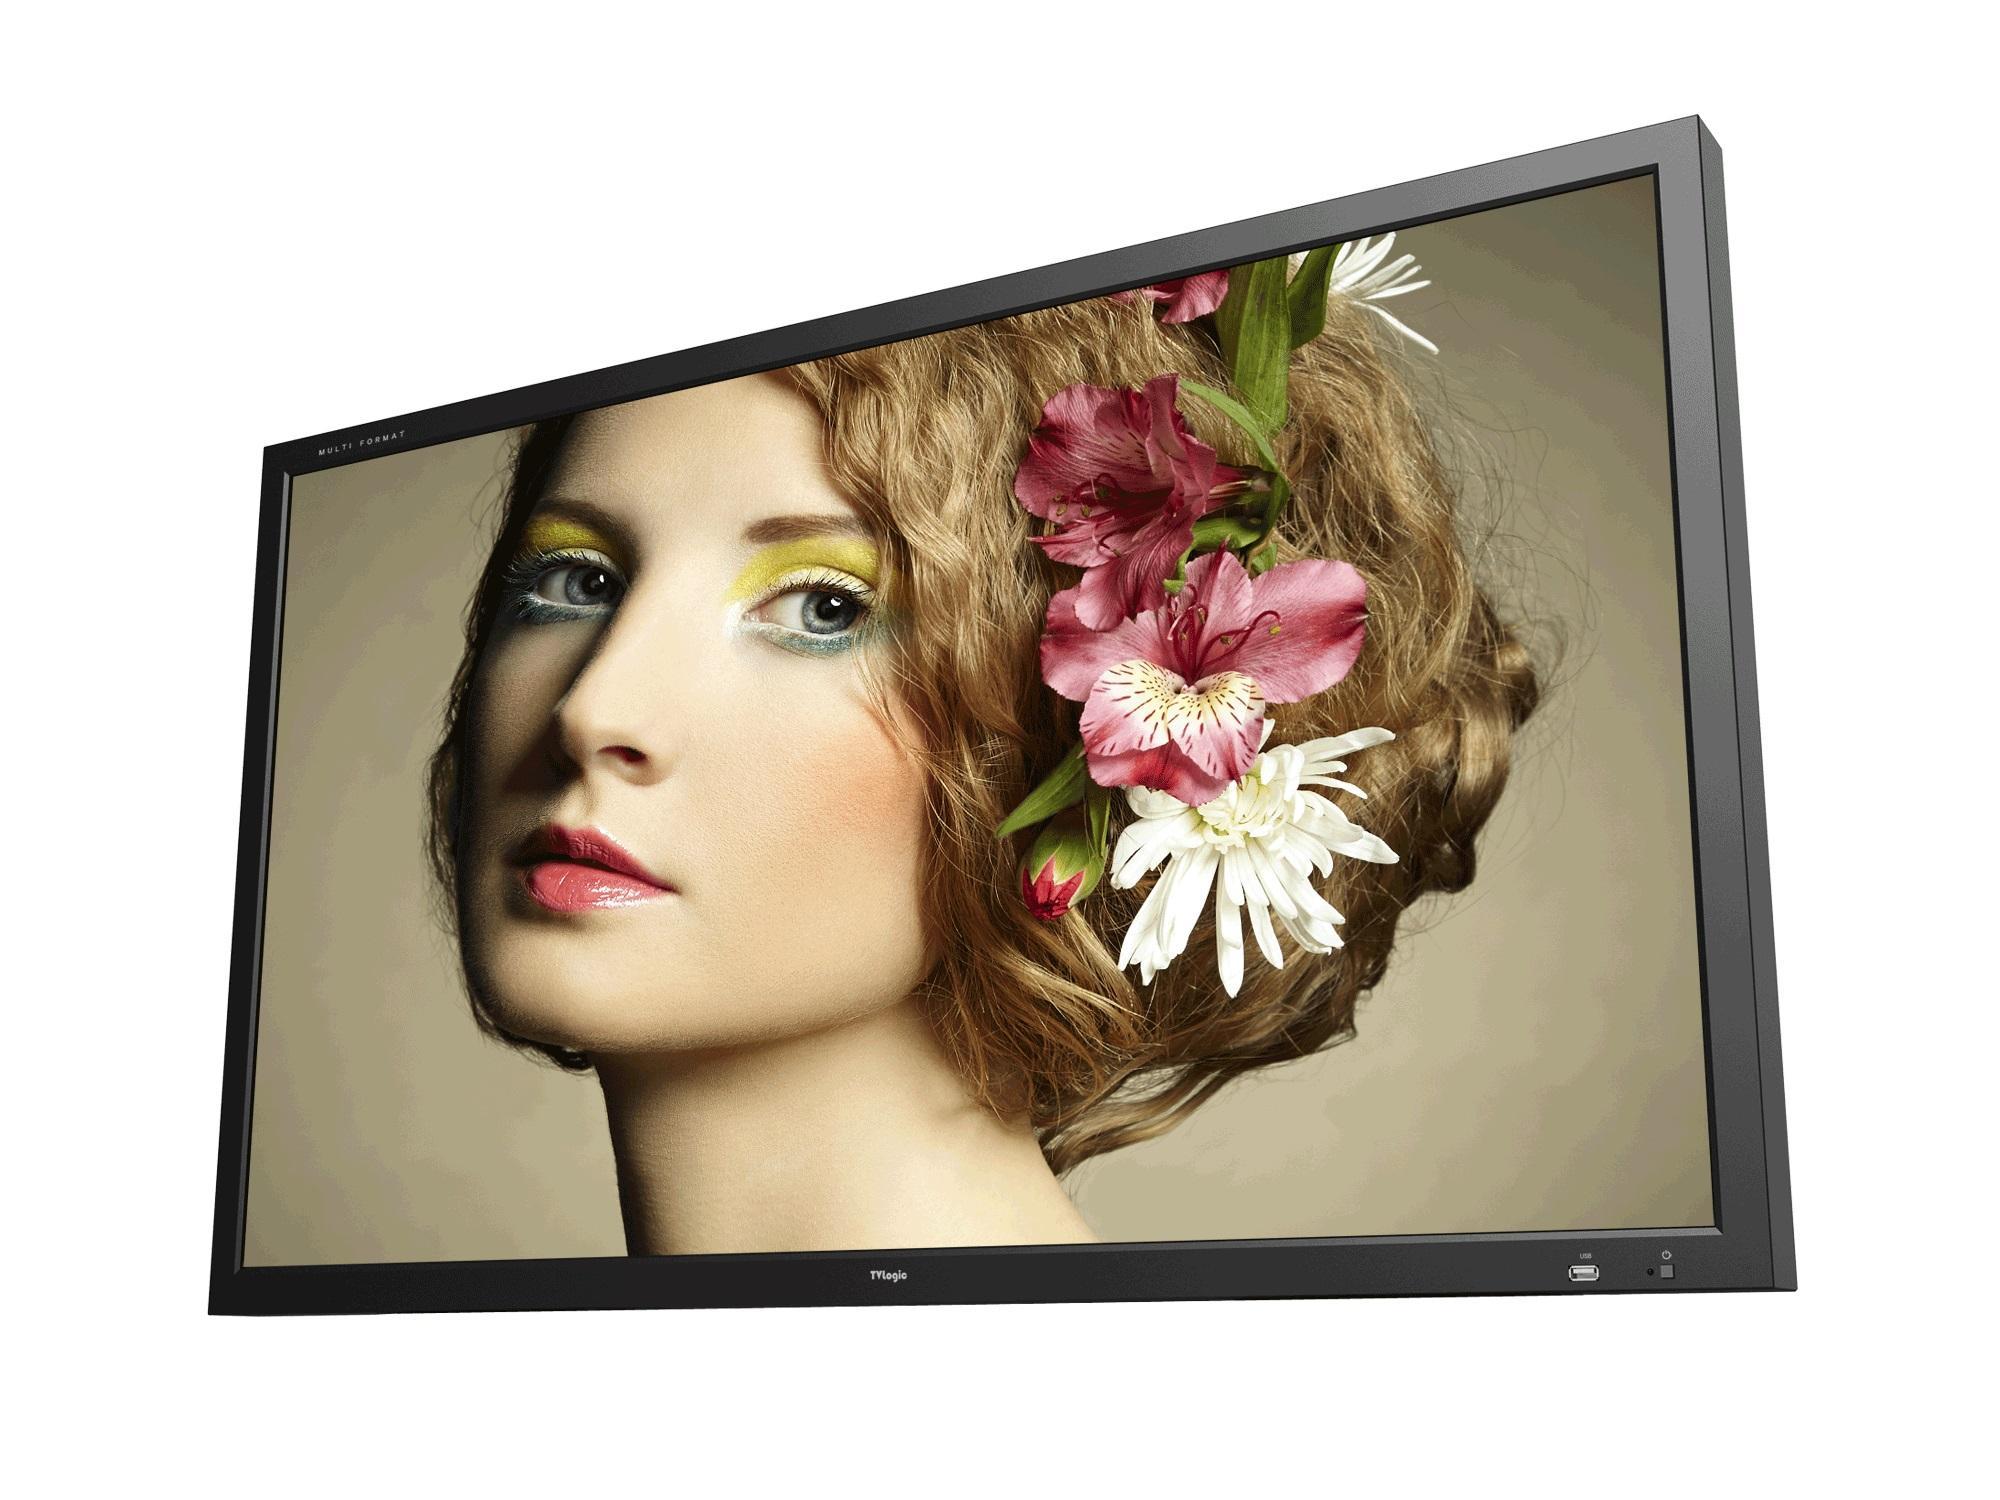 TVlogic SWM-460A 46 inch 1920x1080 (10-bit dithered) Studio Wall LCD Monitor